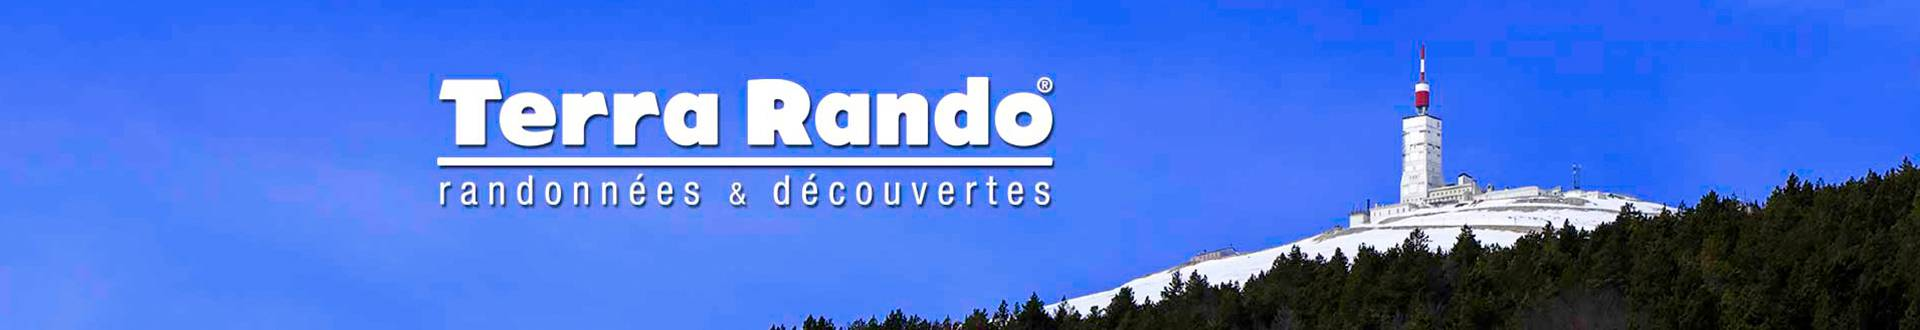 Terra Rando   Flassan France   360 3D VR tours